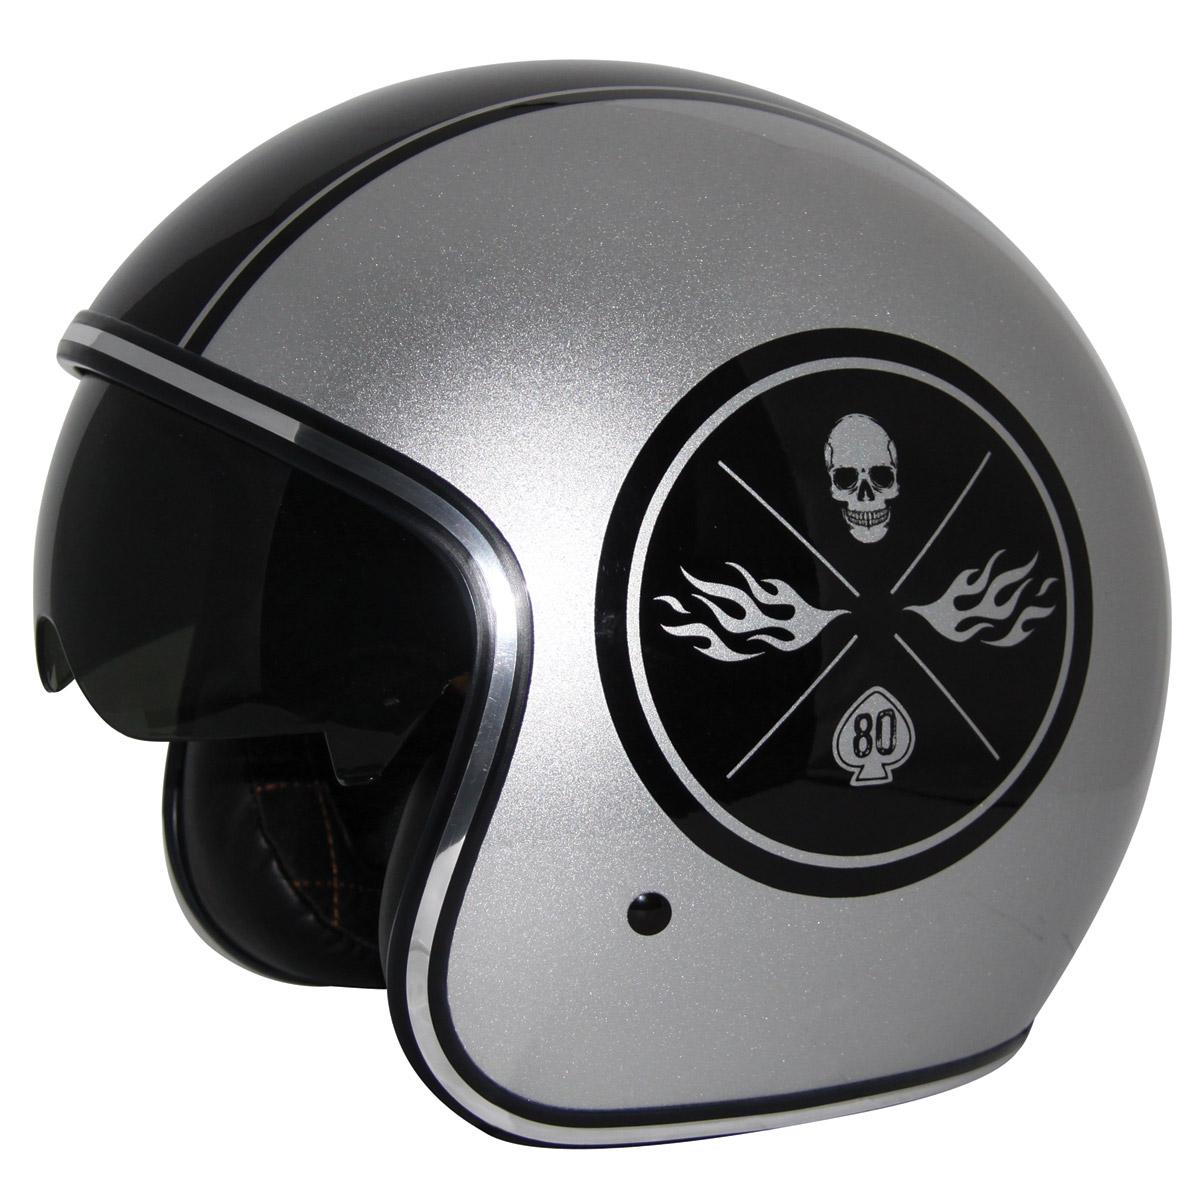 Zox Route 80 DDV Ace Metallic Silver Open Face Helmet